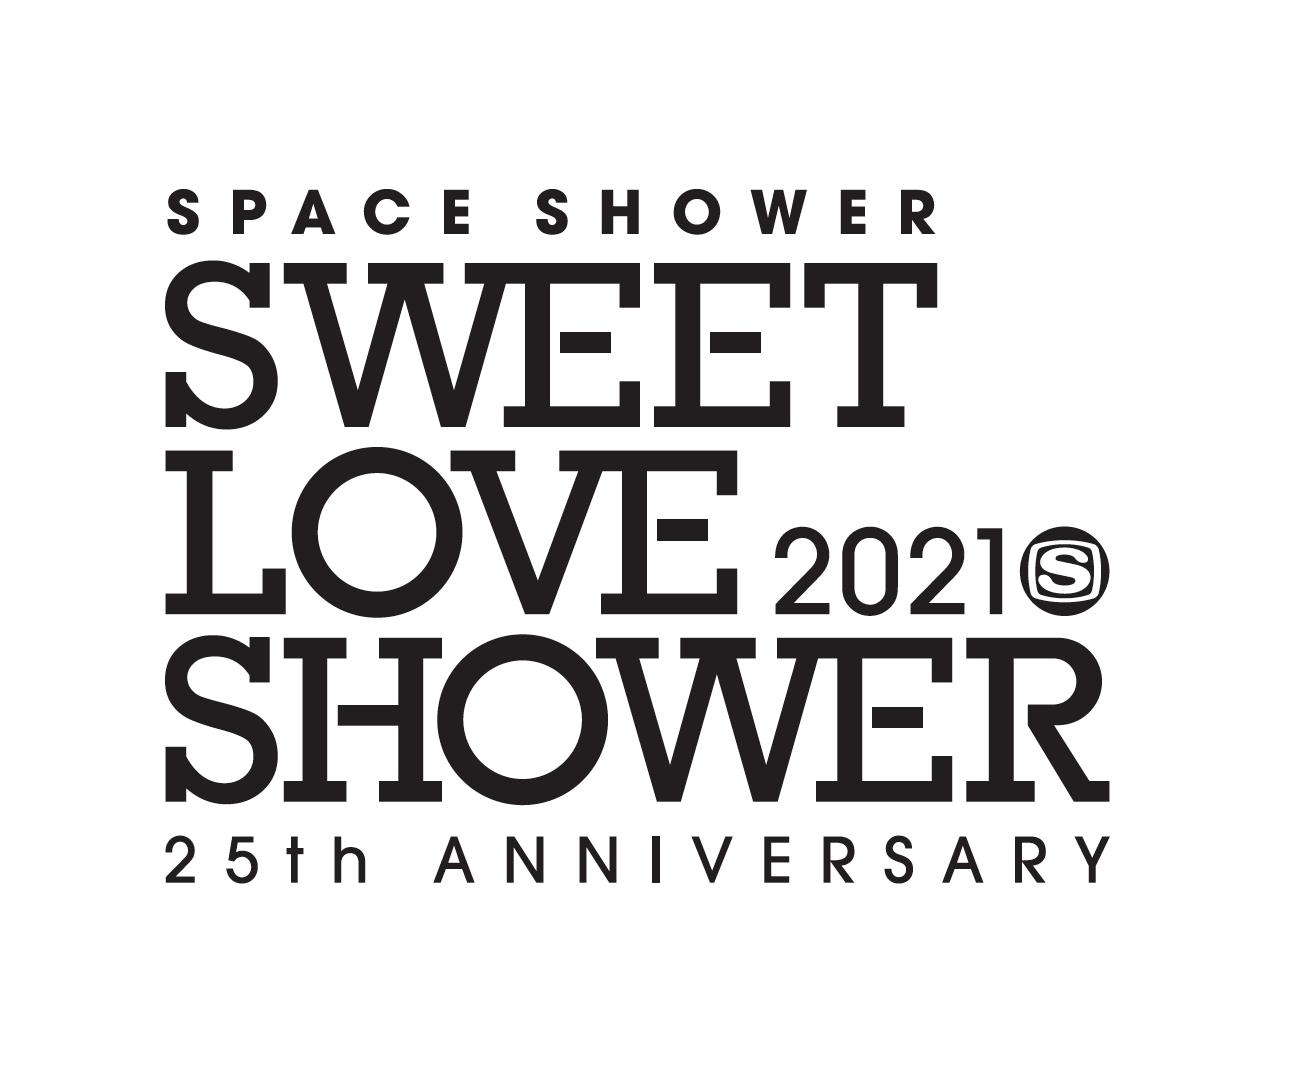 『SPACE SHOWER SWEET LOVE SHOWER 2021 -25th ANNIVERSARY-』